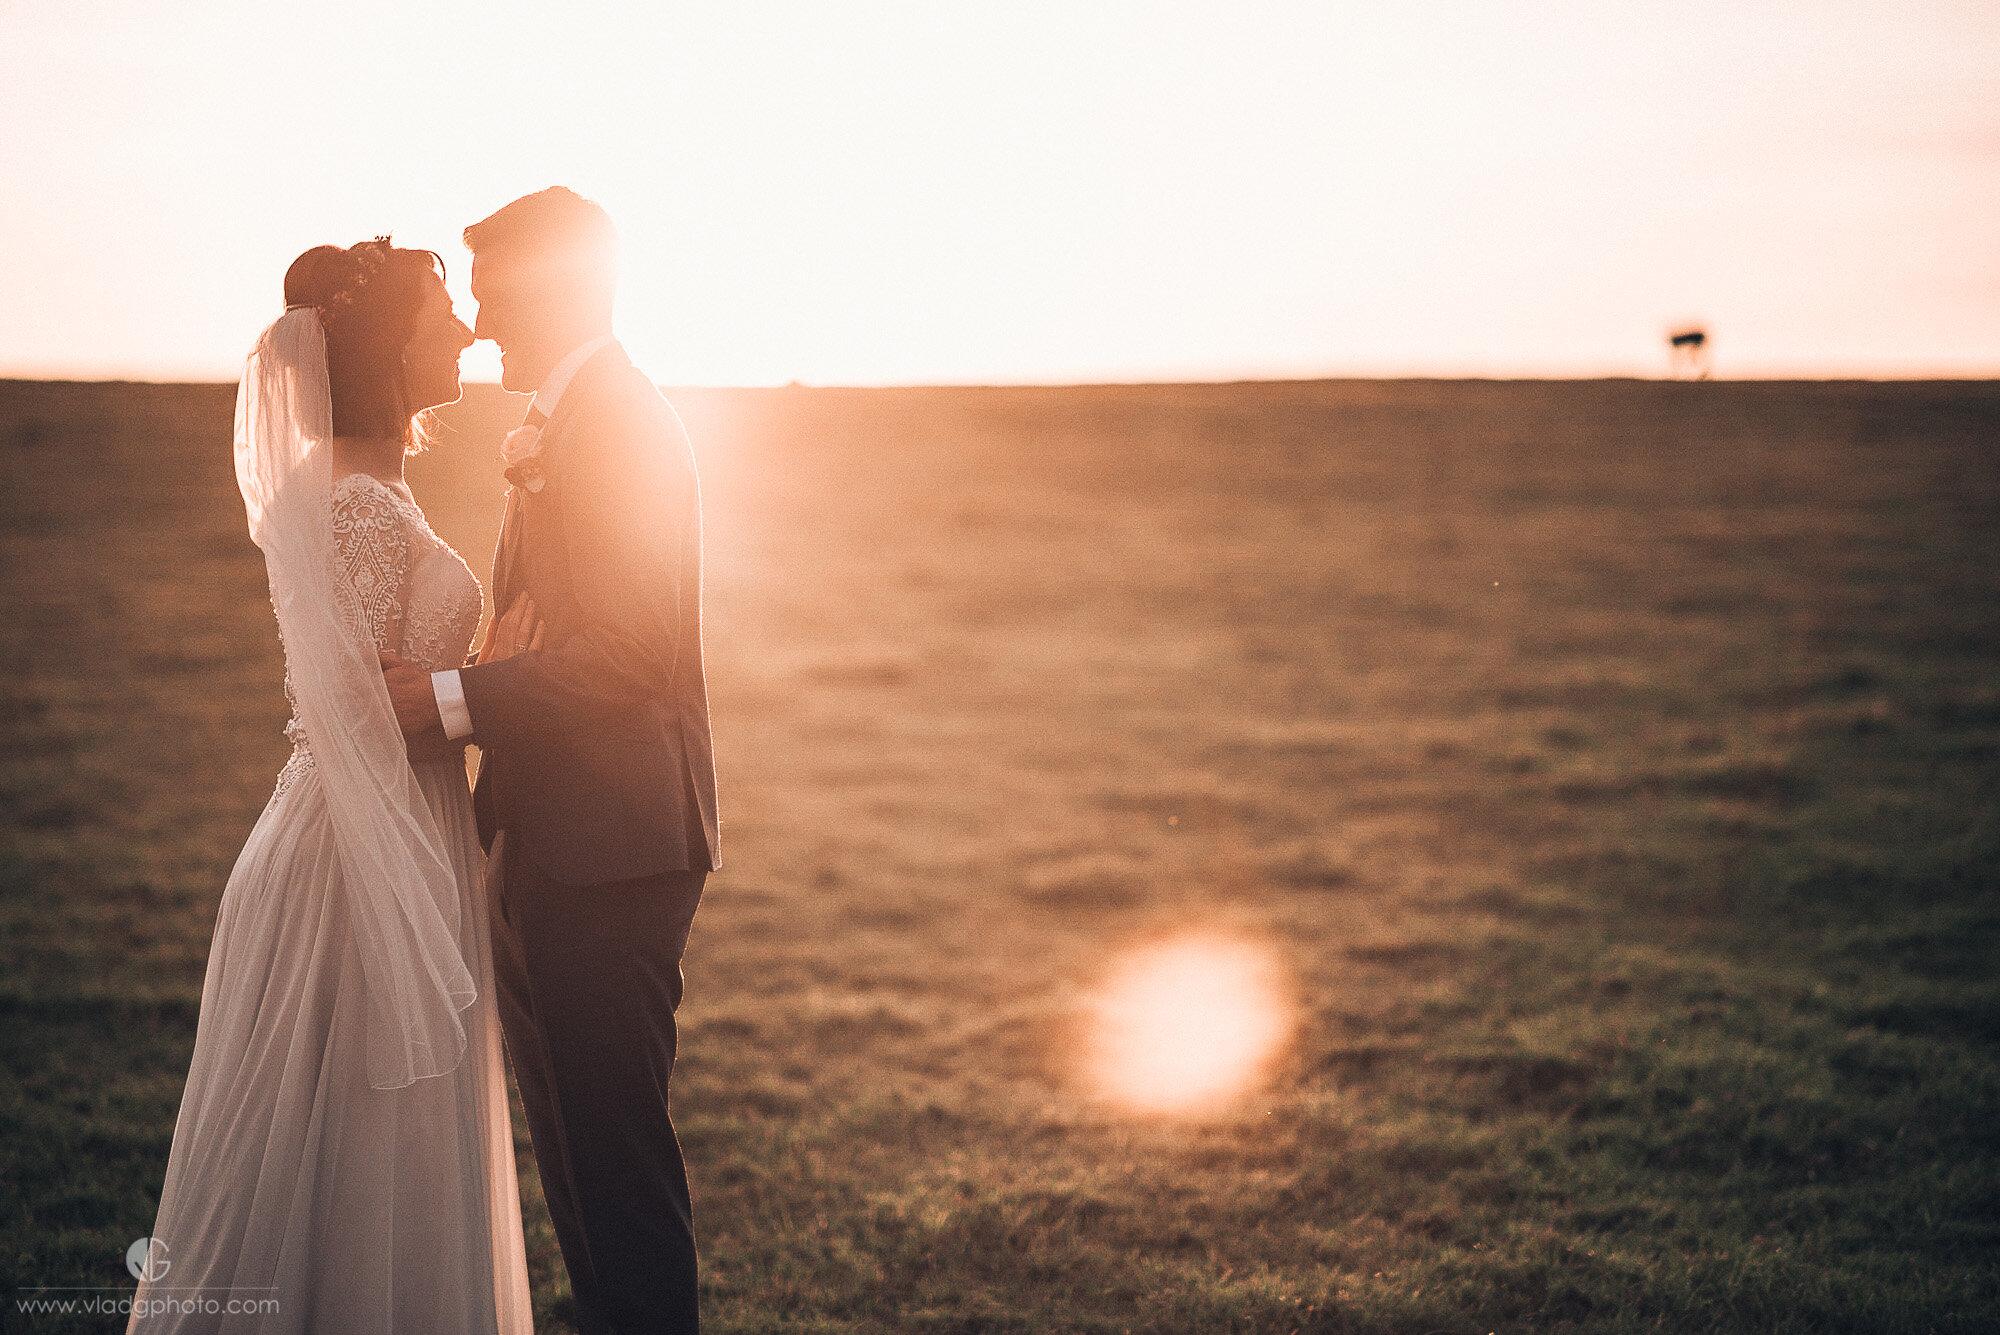 Wedding Photographer Stirk House Gisburn_3.jpg